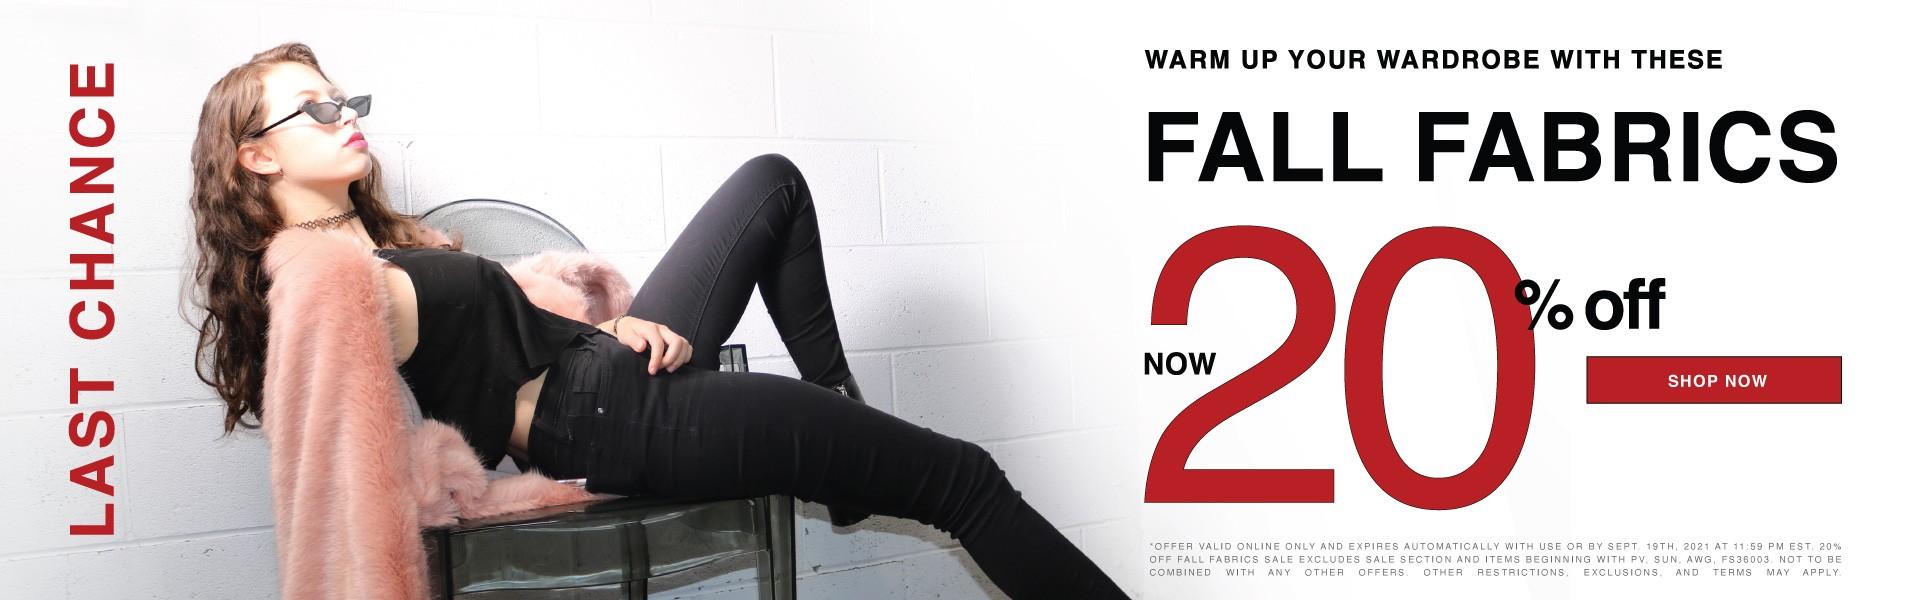 Get Cozy! Shop 20% off Fall Fabrics Today!